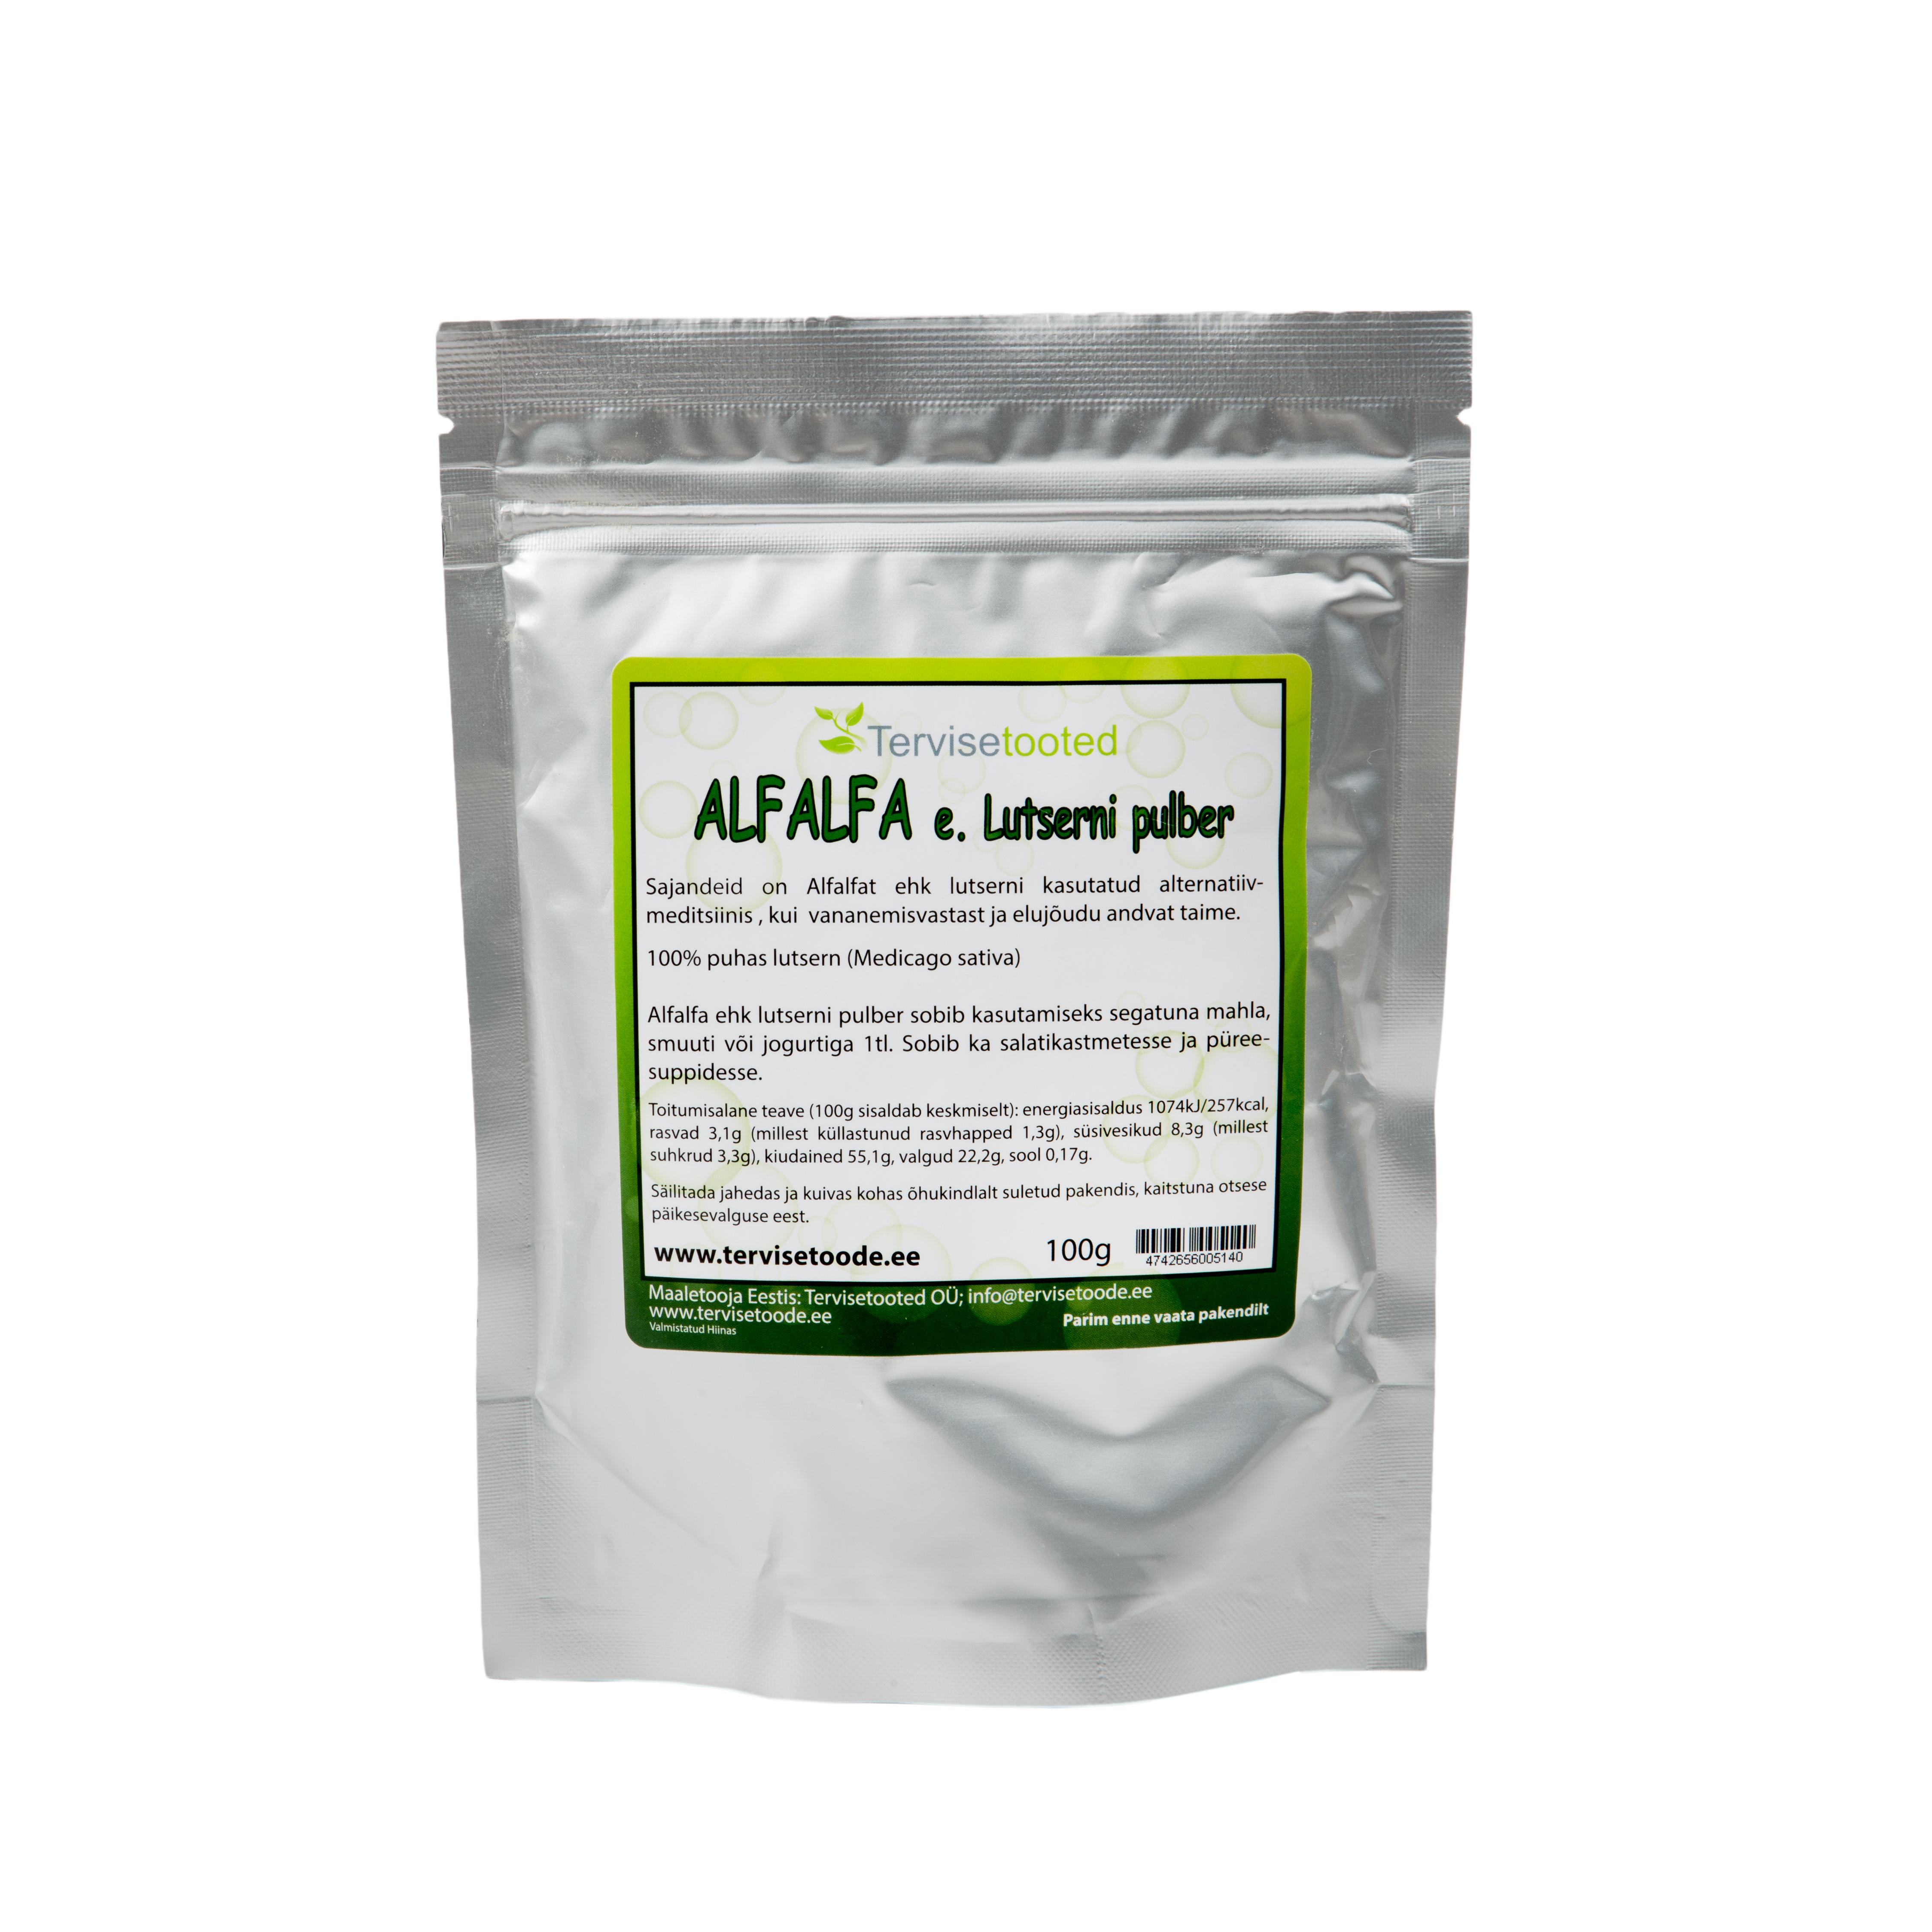 Alfalfa ehk lutserni pulber 100g